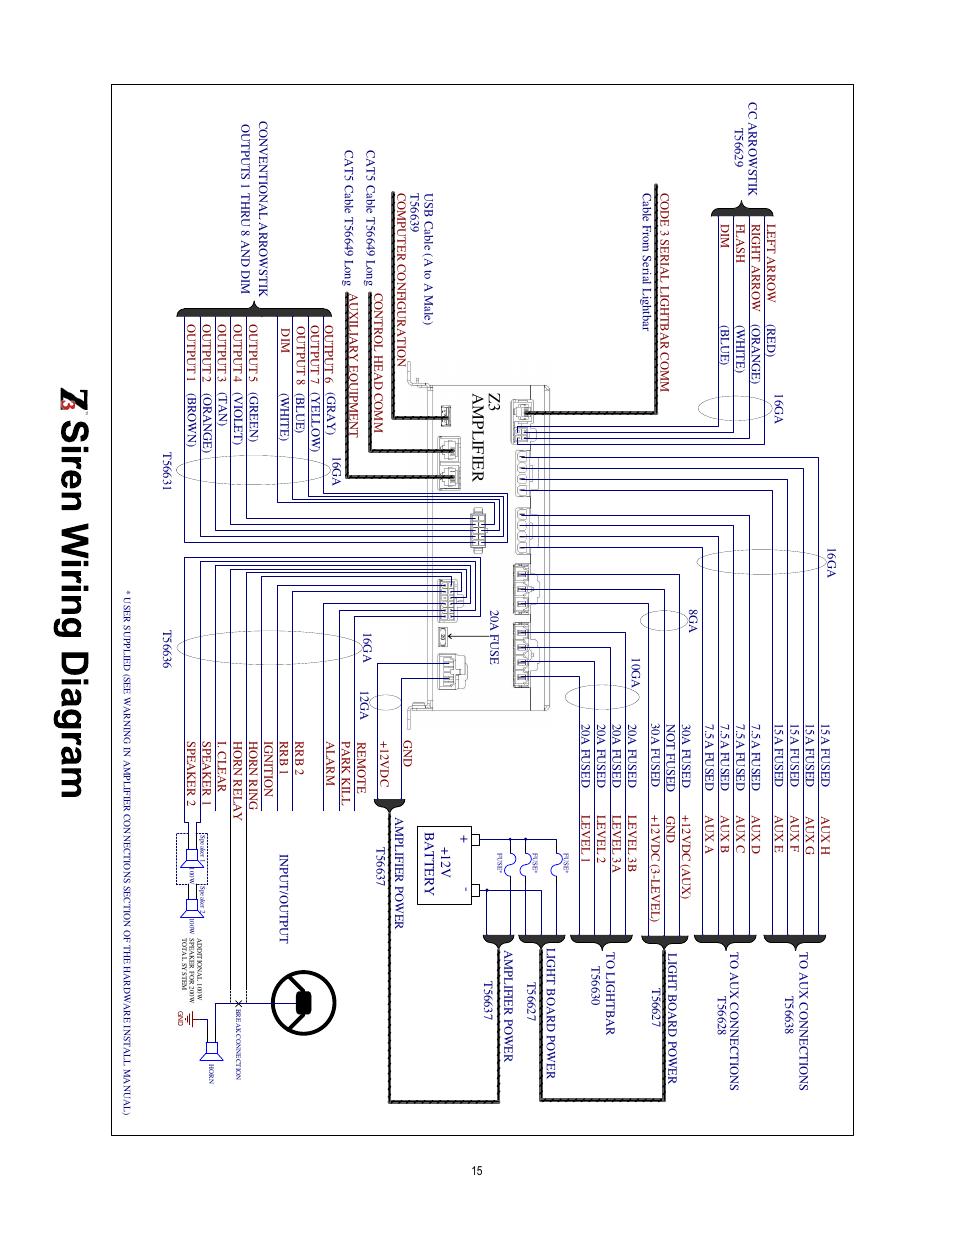 hight resolution of code 3 siren wiring diagram manual e book code 3 siren box model 3892l6 wiring diagram